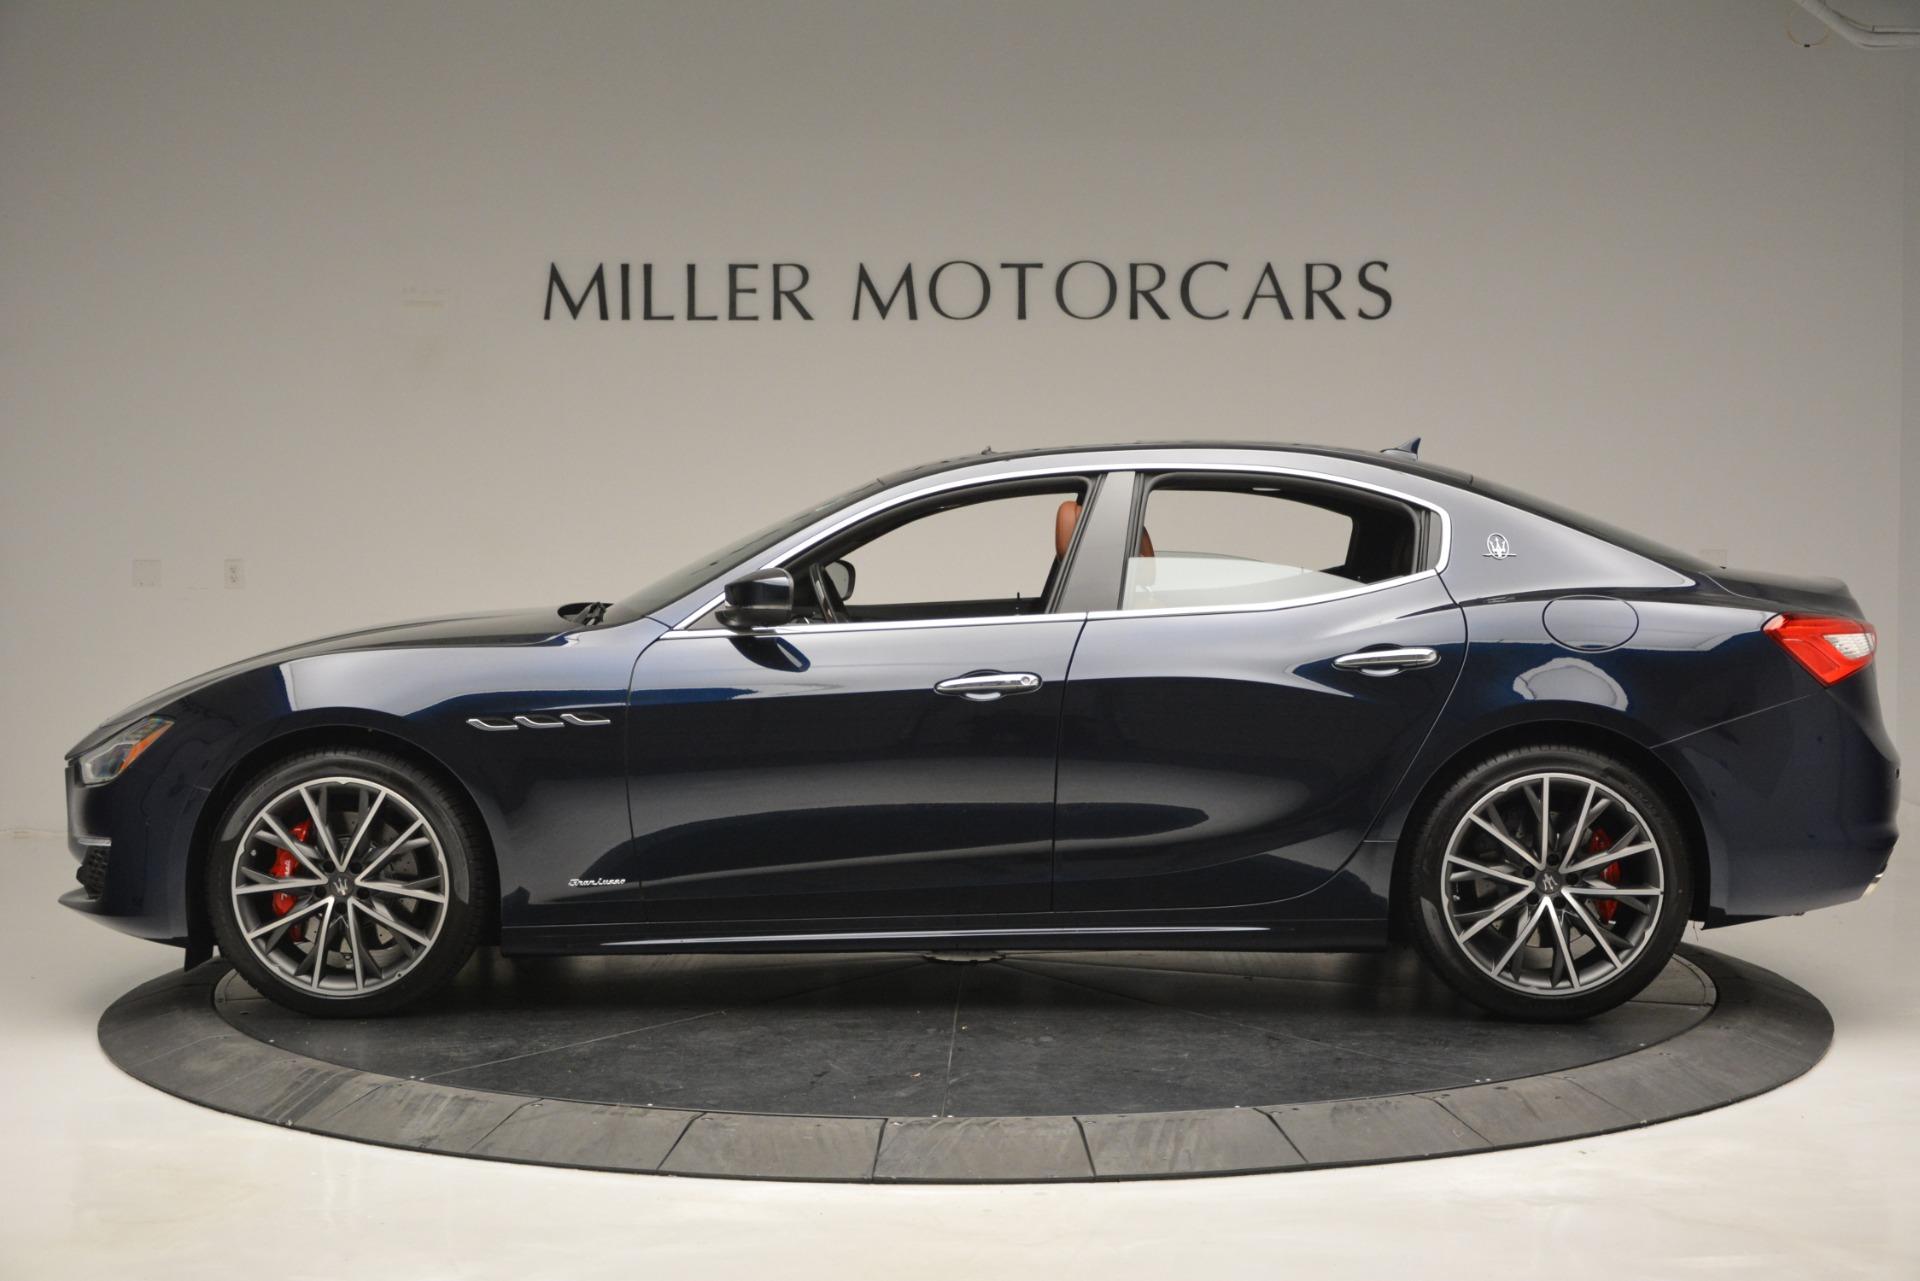 New 2019 Maserati Ghibli S Q4 GranSport For Sale In Greenwich, CT 2948_p4